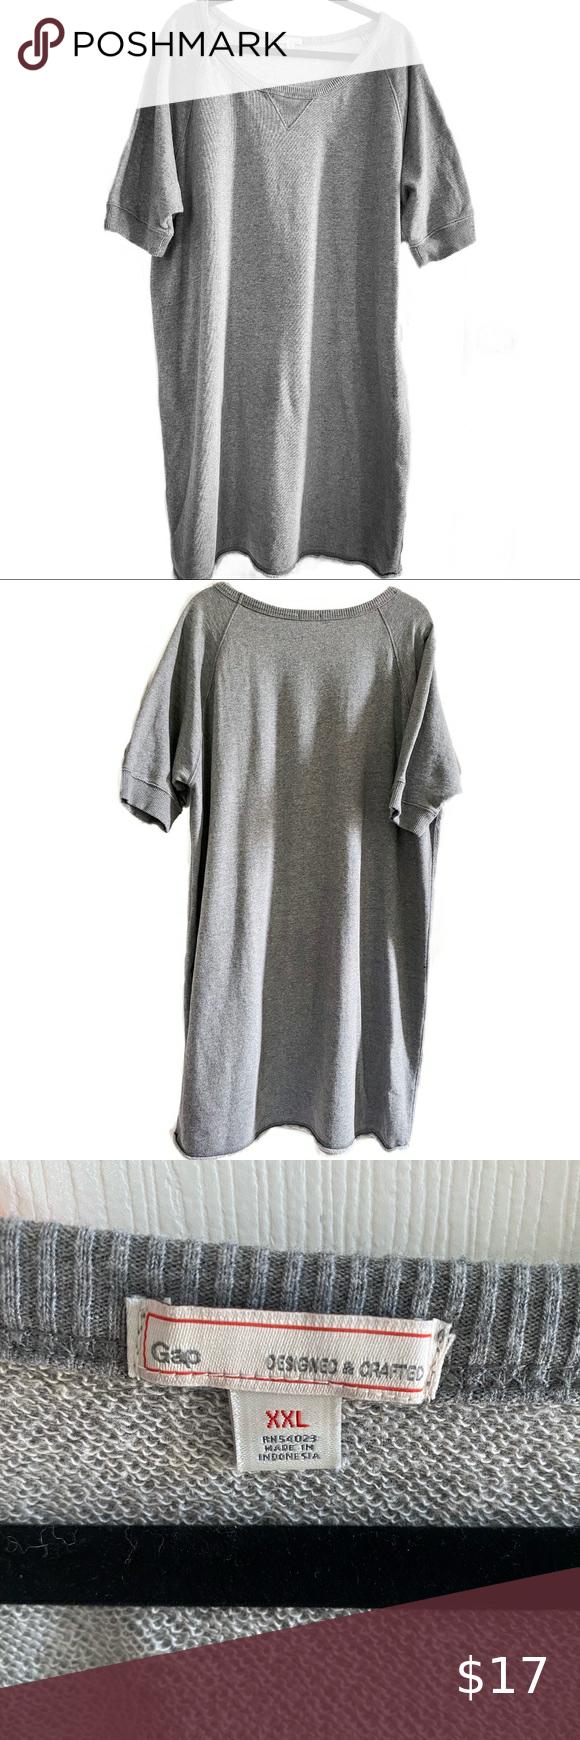 Gap Size Xxl Grey Sweatshirt Tunic Nwot Tunic Sweatshirt Grey Sweatshirt Sweatshirts [ 1740 x 580 Pixel ]